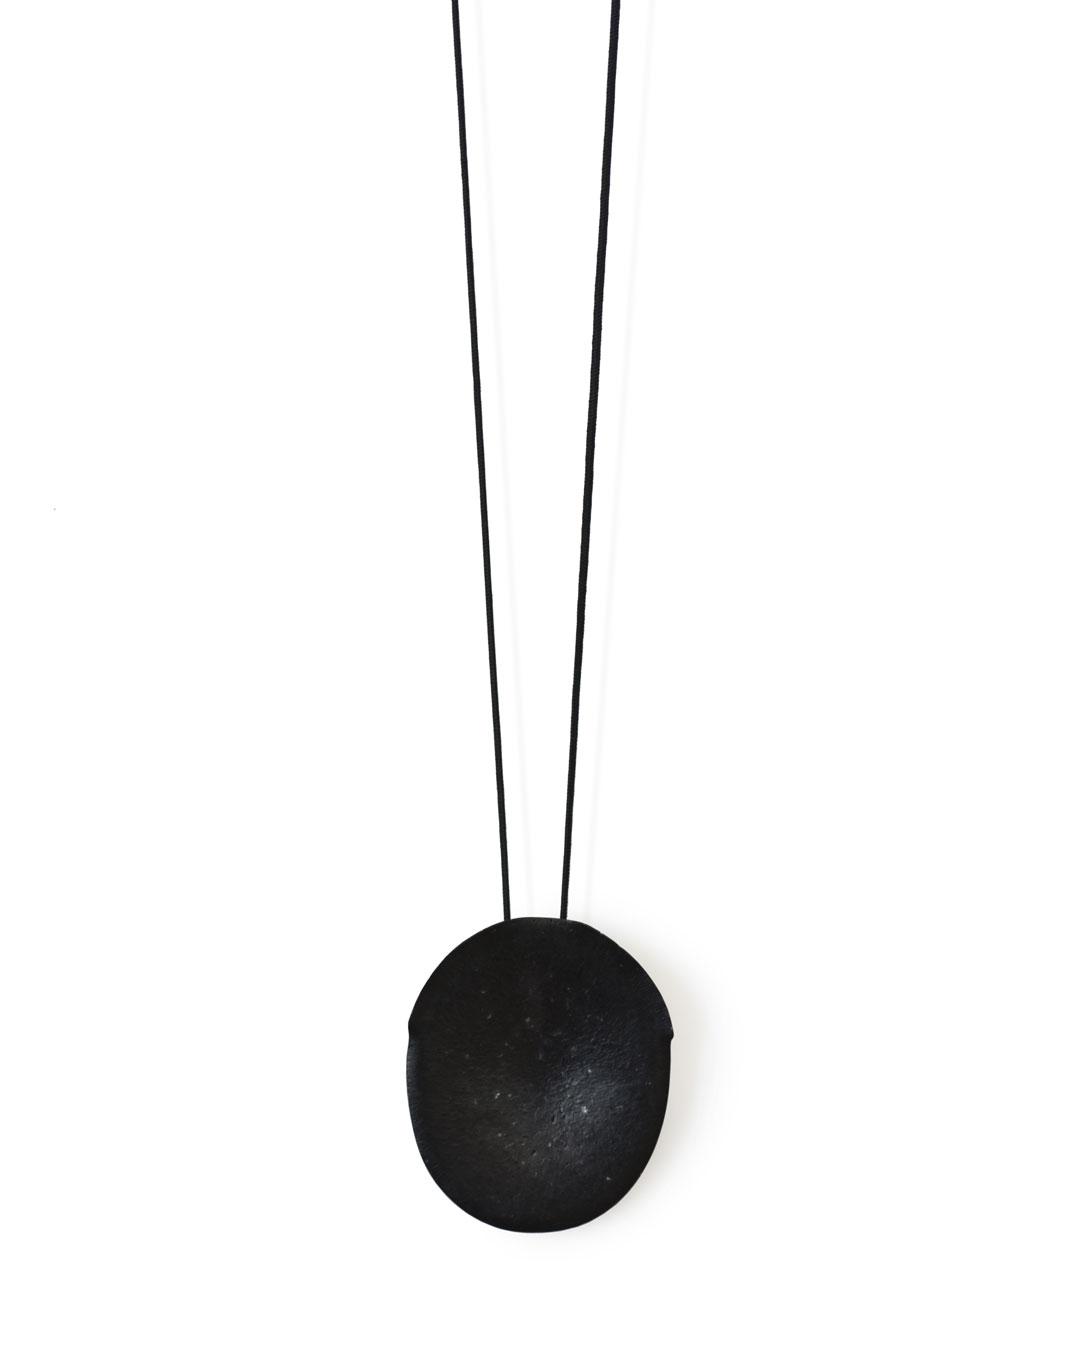 Karin Seufert, untitled, 2018, pendant; anodised aluminium, thread, 68 x 57 x 11 mm, €605